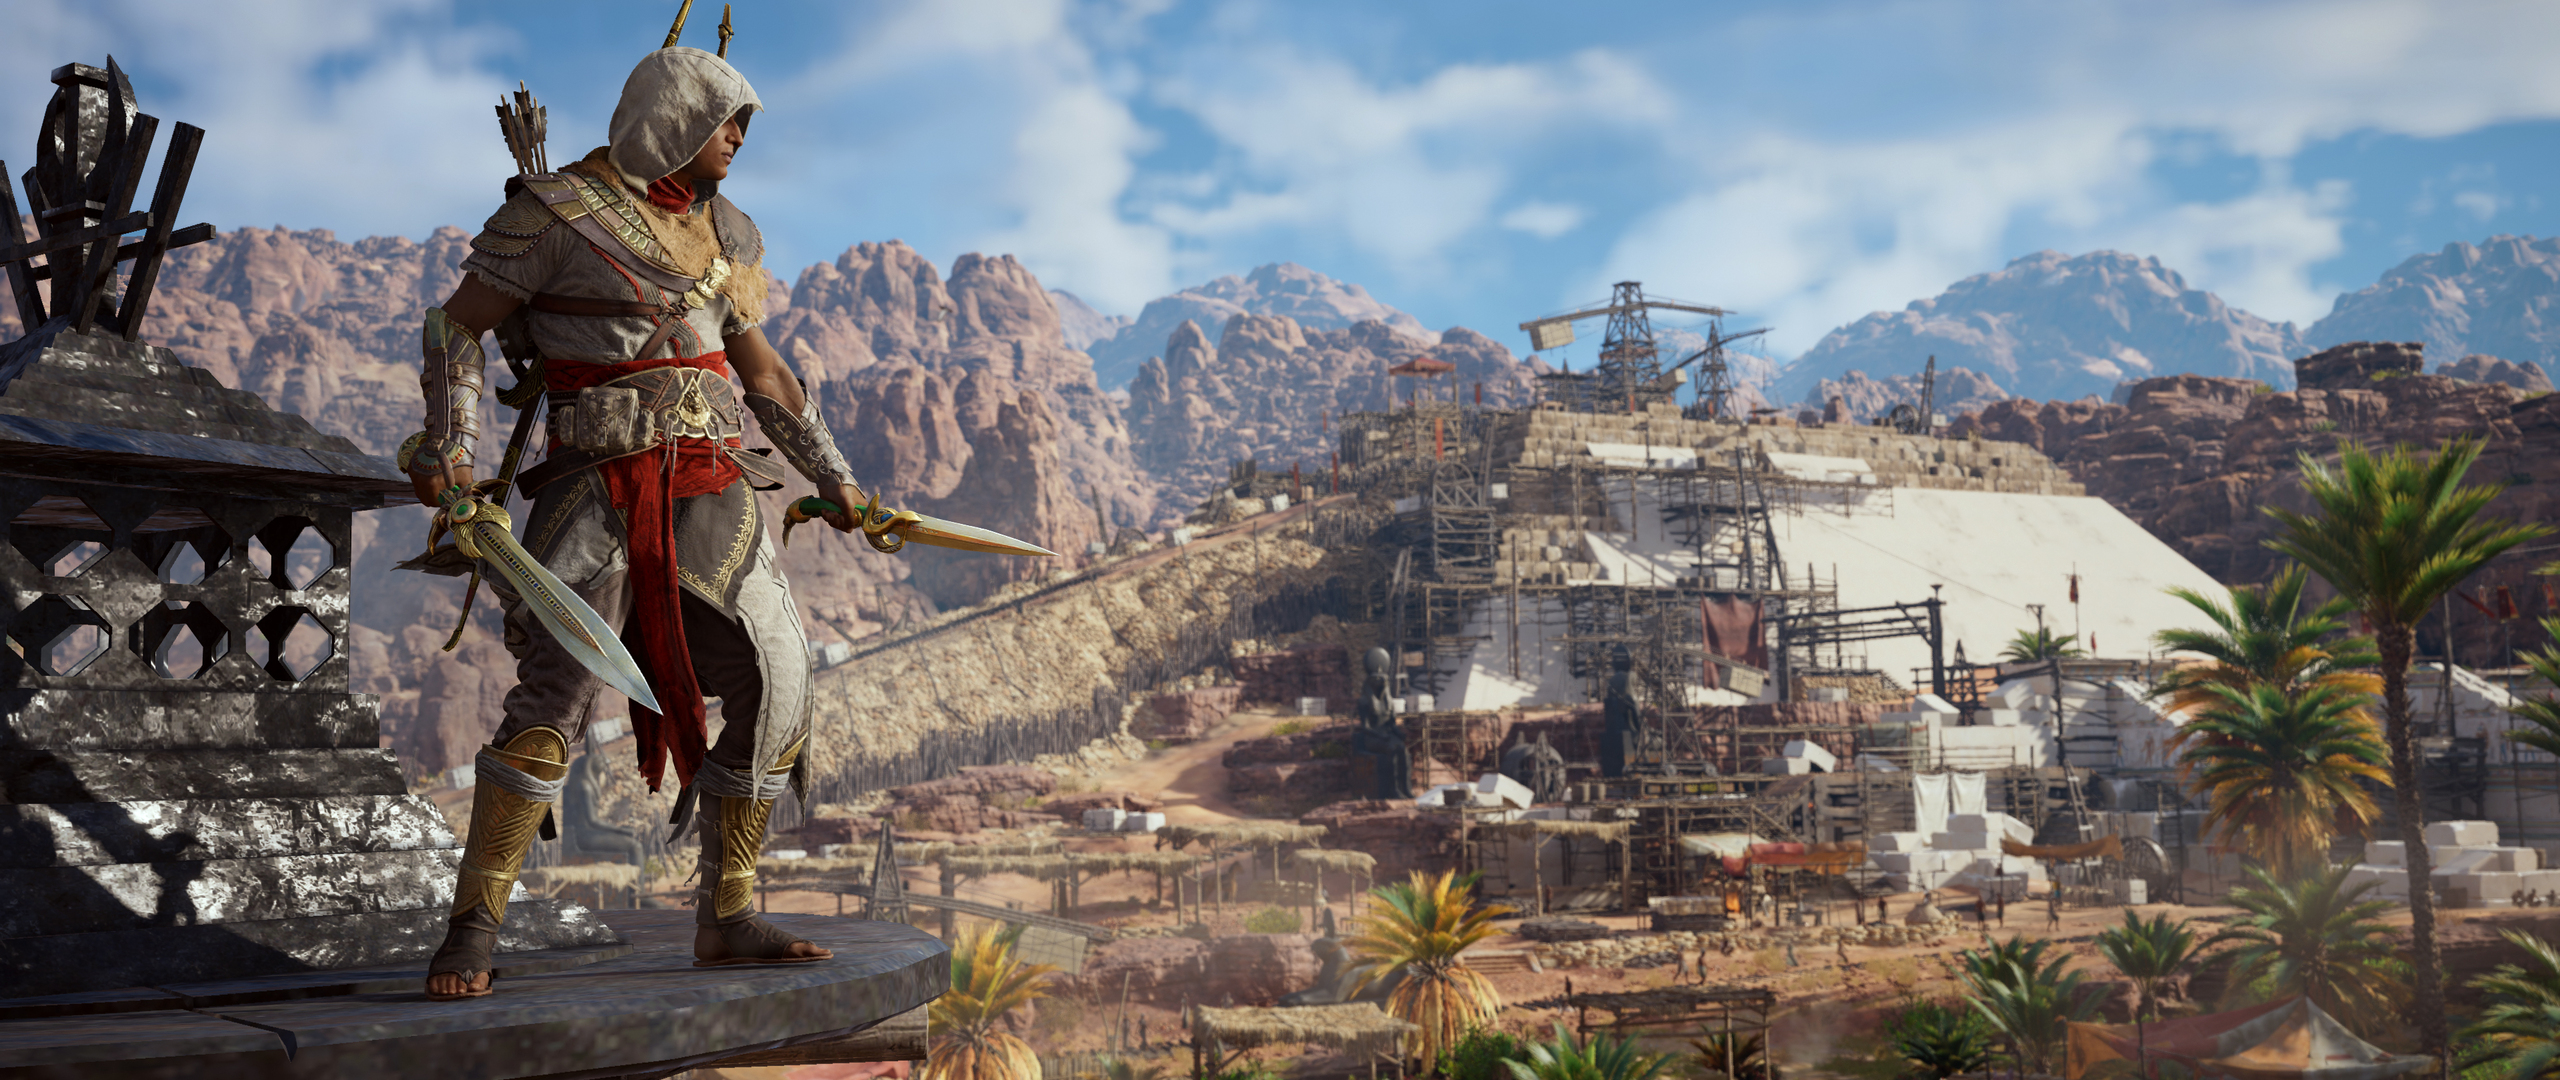 2560x1080 Bayek Of Siwa Assassins Creed Origins 2560x1080